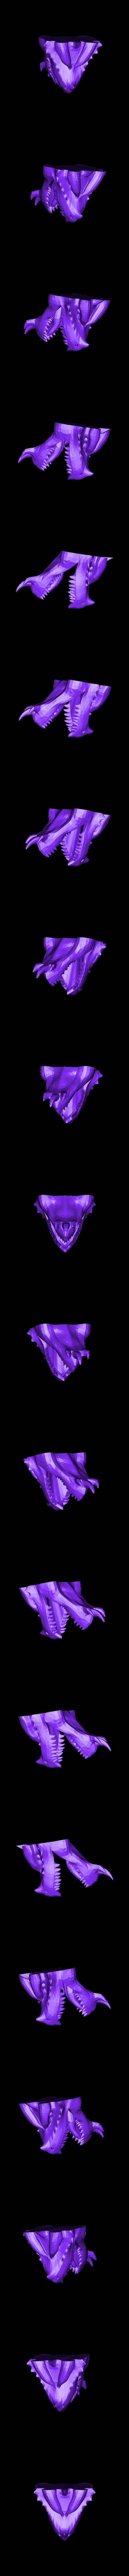 Red_Dragon_Updated_Face.stl Download free STL file Dragon Sculpture • 3D printing model, knadityas92